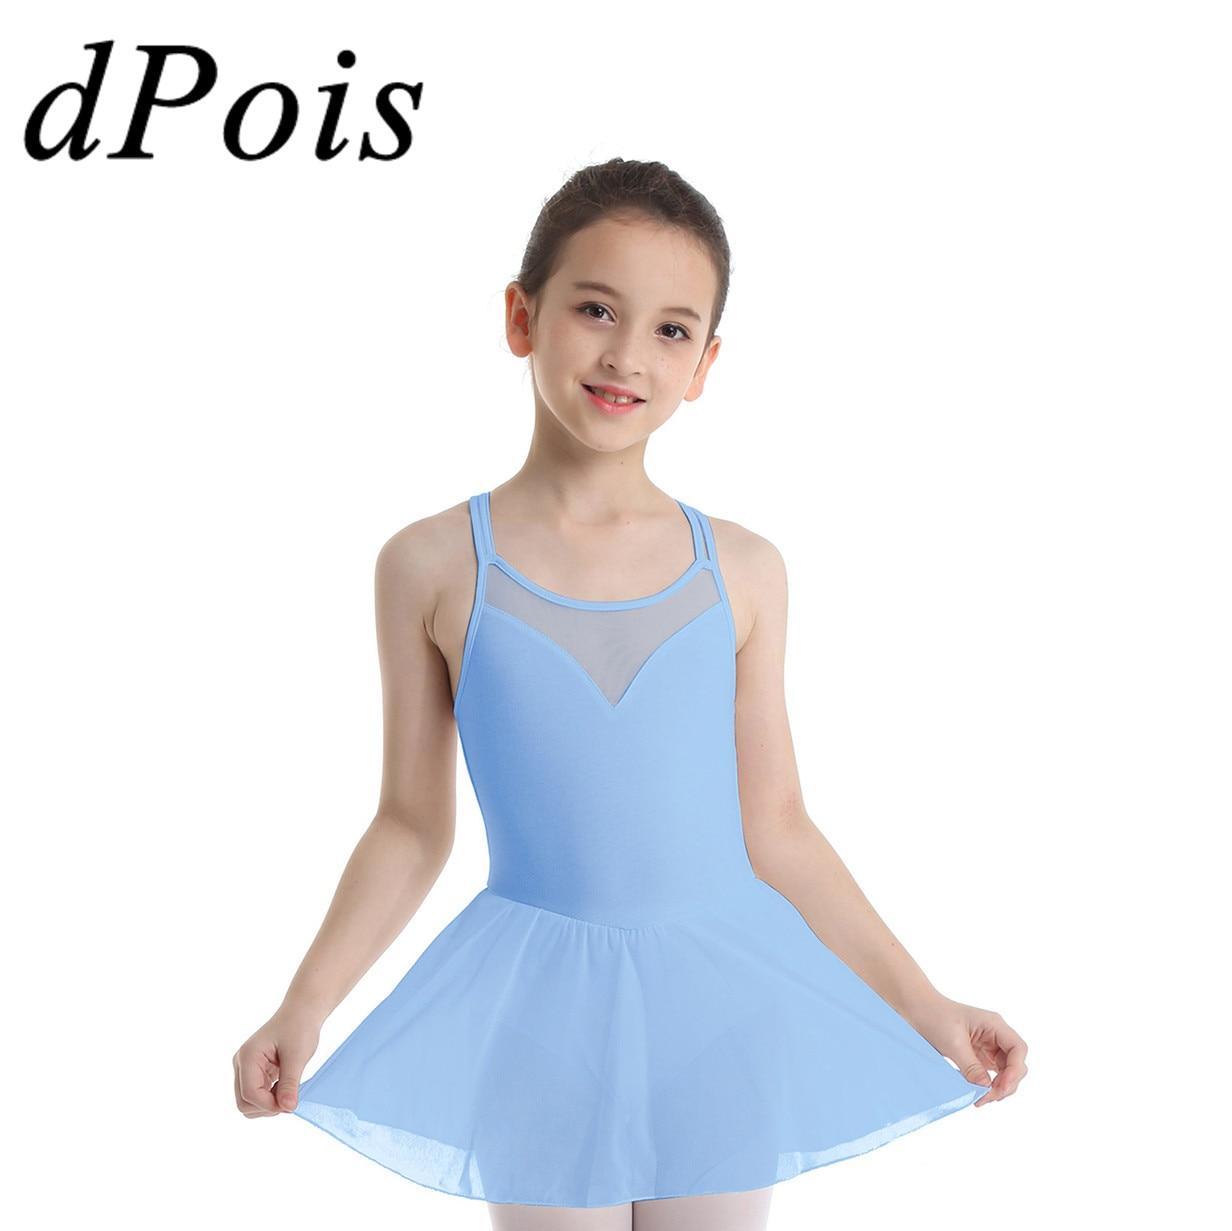 Kids Girls Ballet Dance Tutu Dress Gym Lyrical Leotard Skirt Skating Dancewear